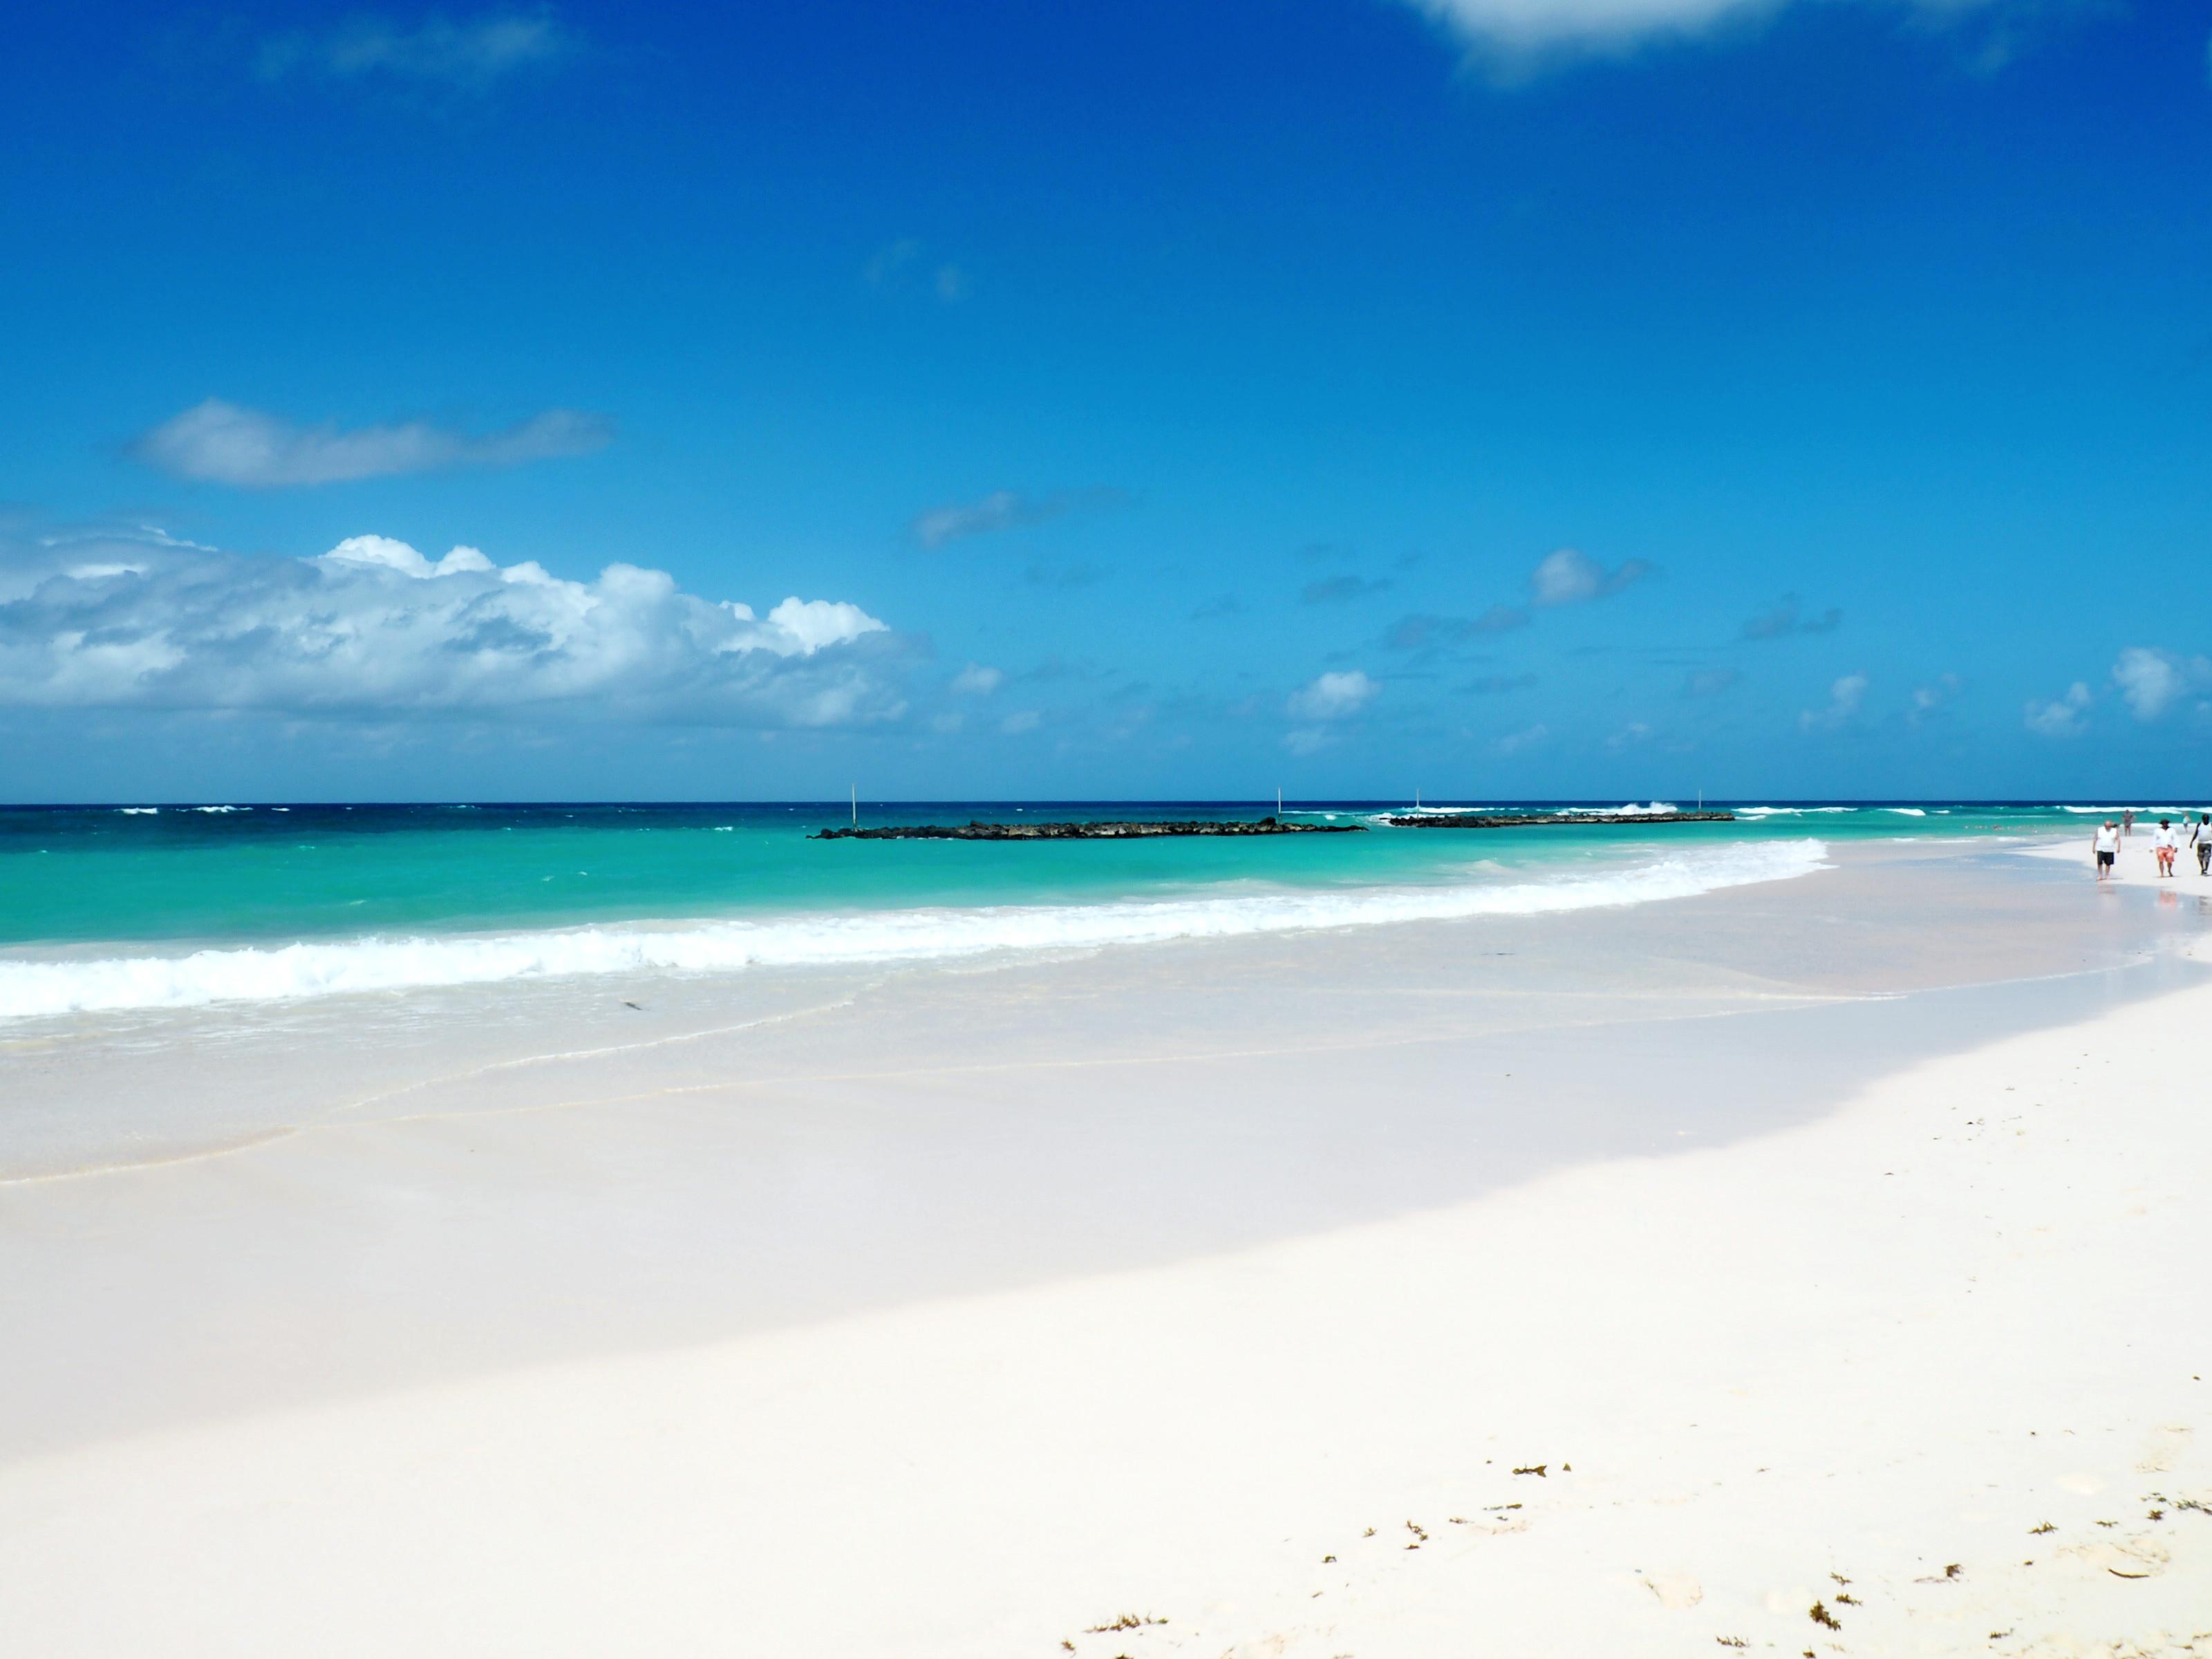 Tommeezjerry-Männerblog-Berlinblog-Fashionblog-Styleblog-Travelblog-Travel-Reiseblog-Reisen-Barbados-Karibik-Carribean-Summer-Sommer-Vacation-23